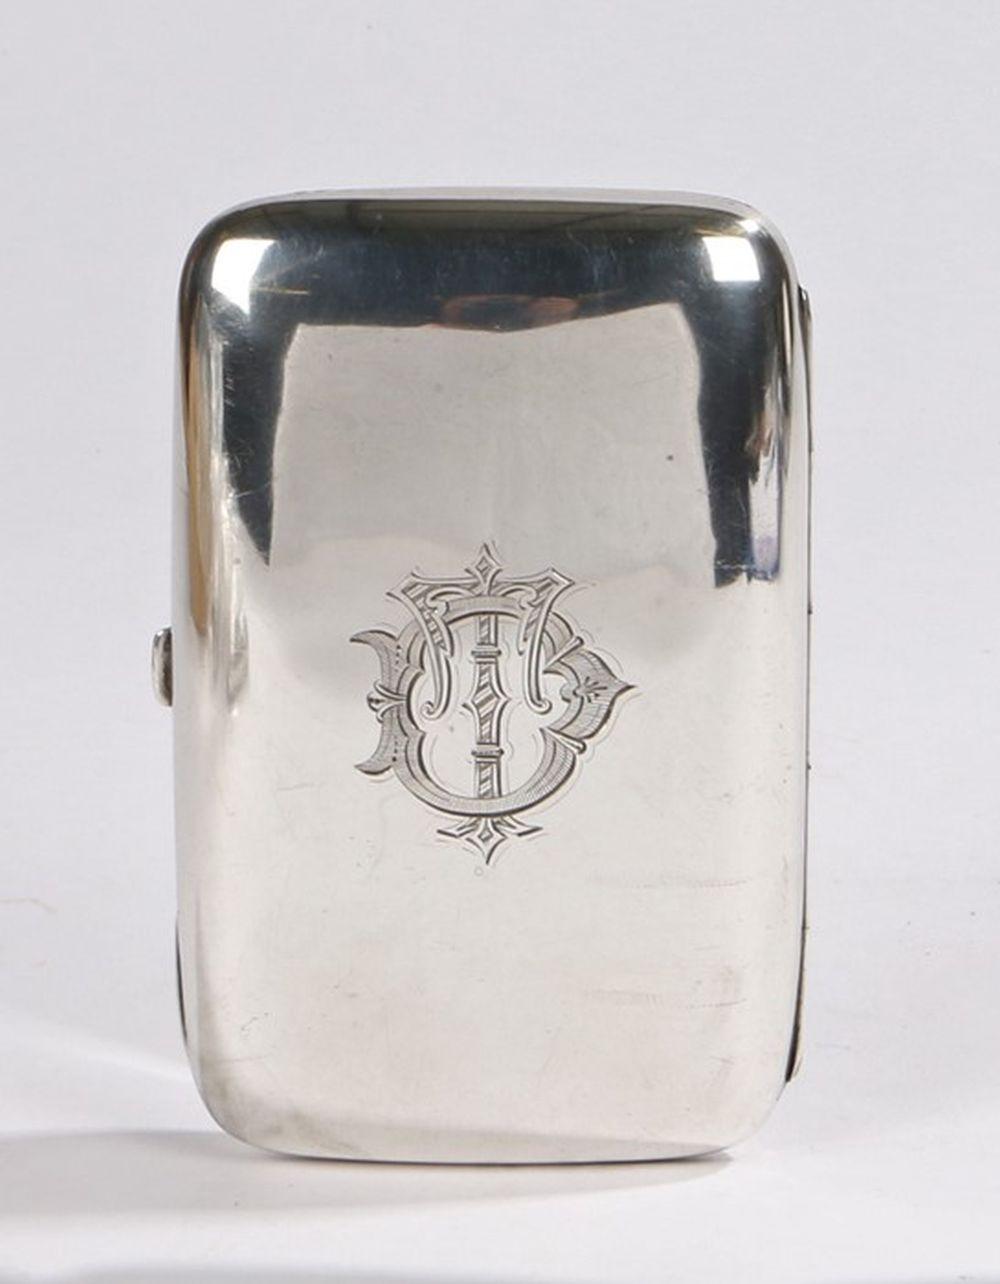 Victorian silver cigar case, Birmingham 1898, maker Joseph Gloster, the exterior monogrammed TD, wit